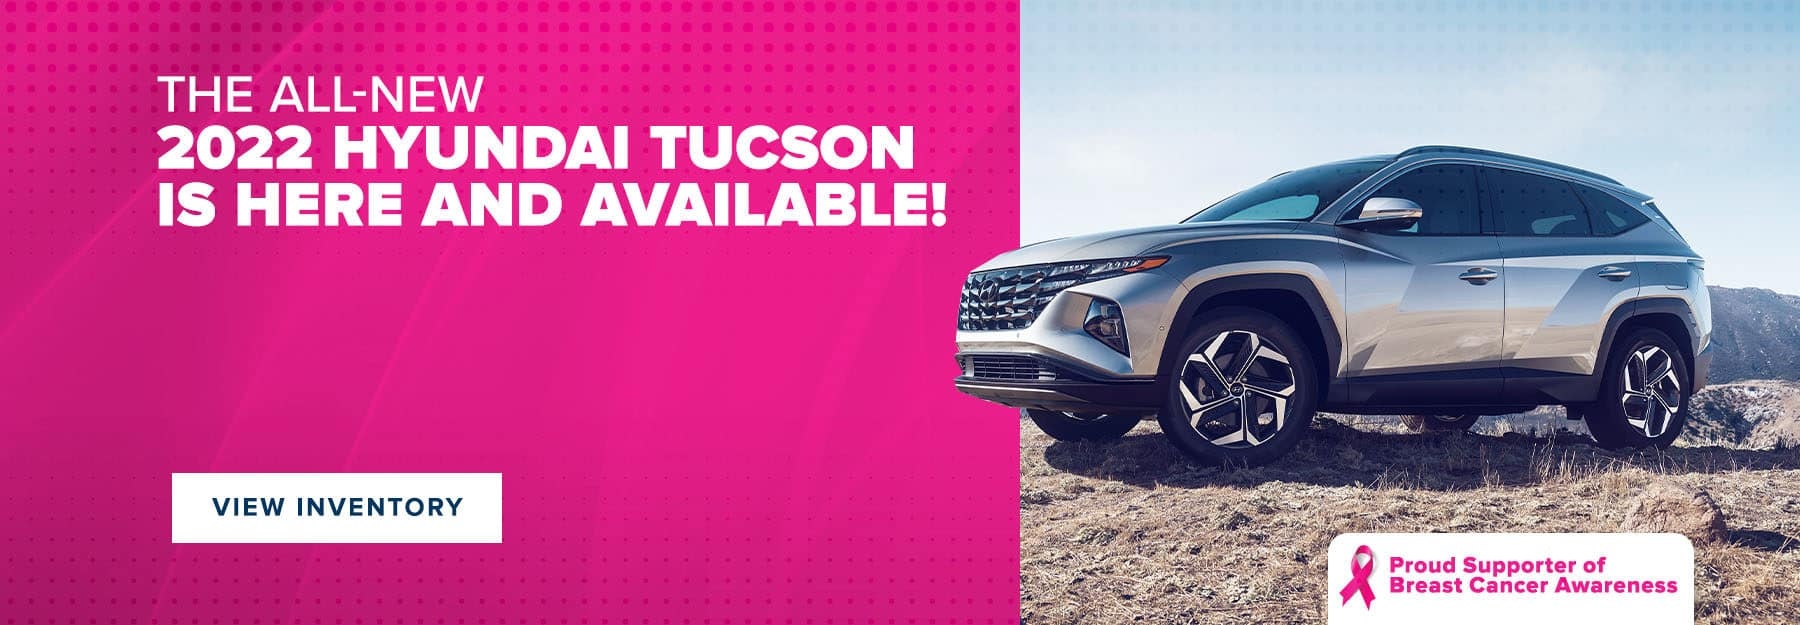 KeyHyundaiManchester_Slide_1800x625_Tucson_10-21